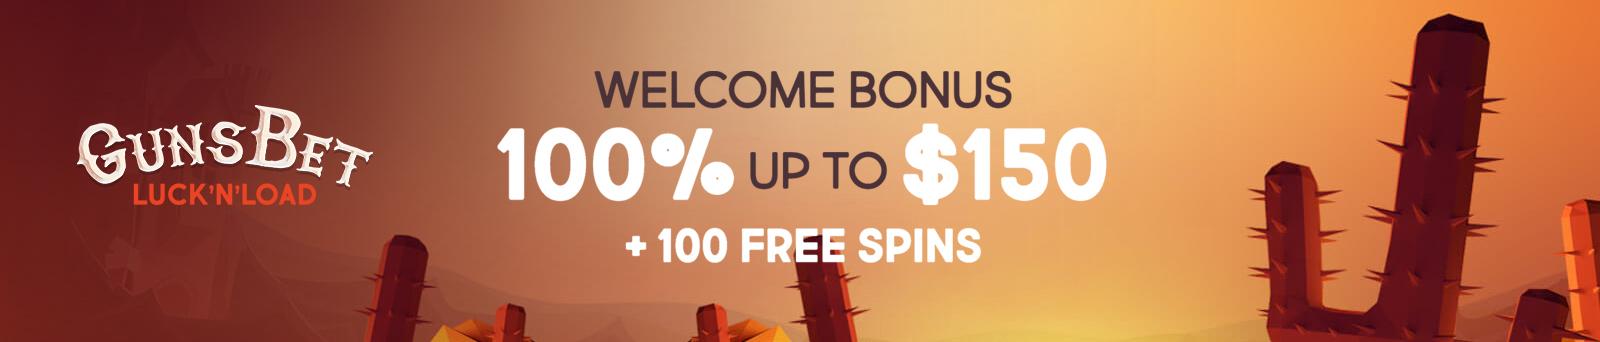 Gunsbet bonus